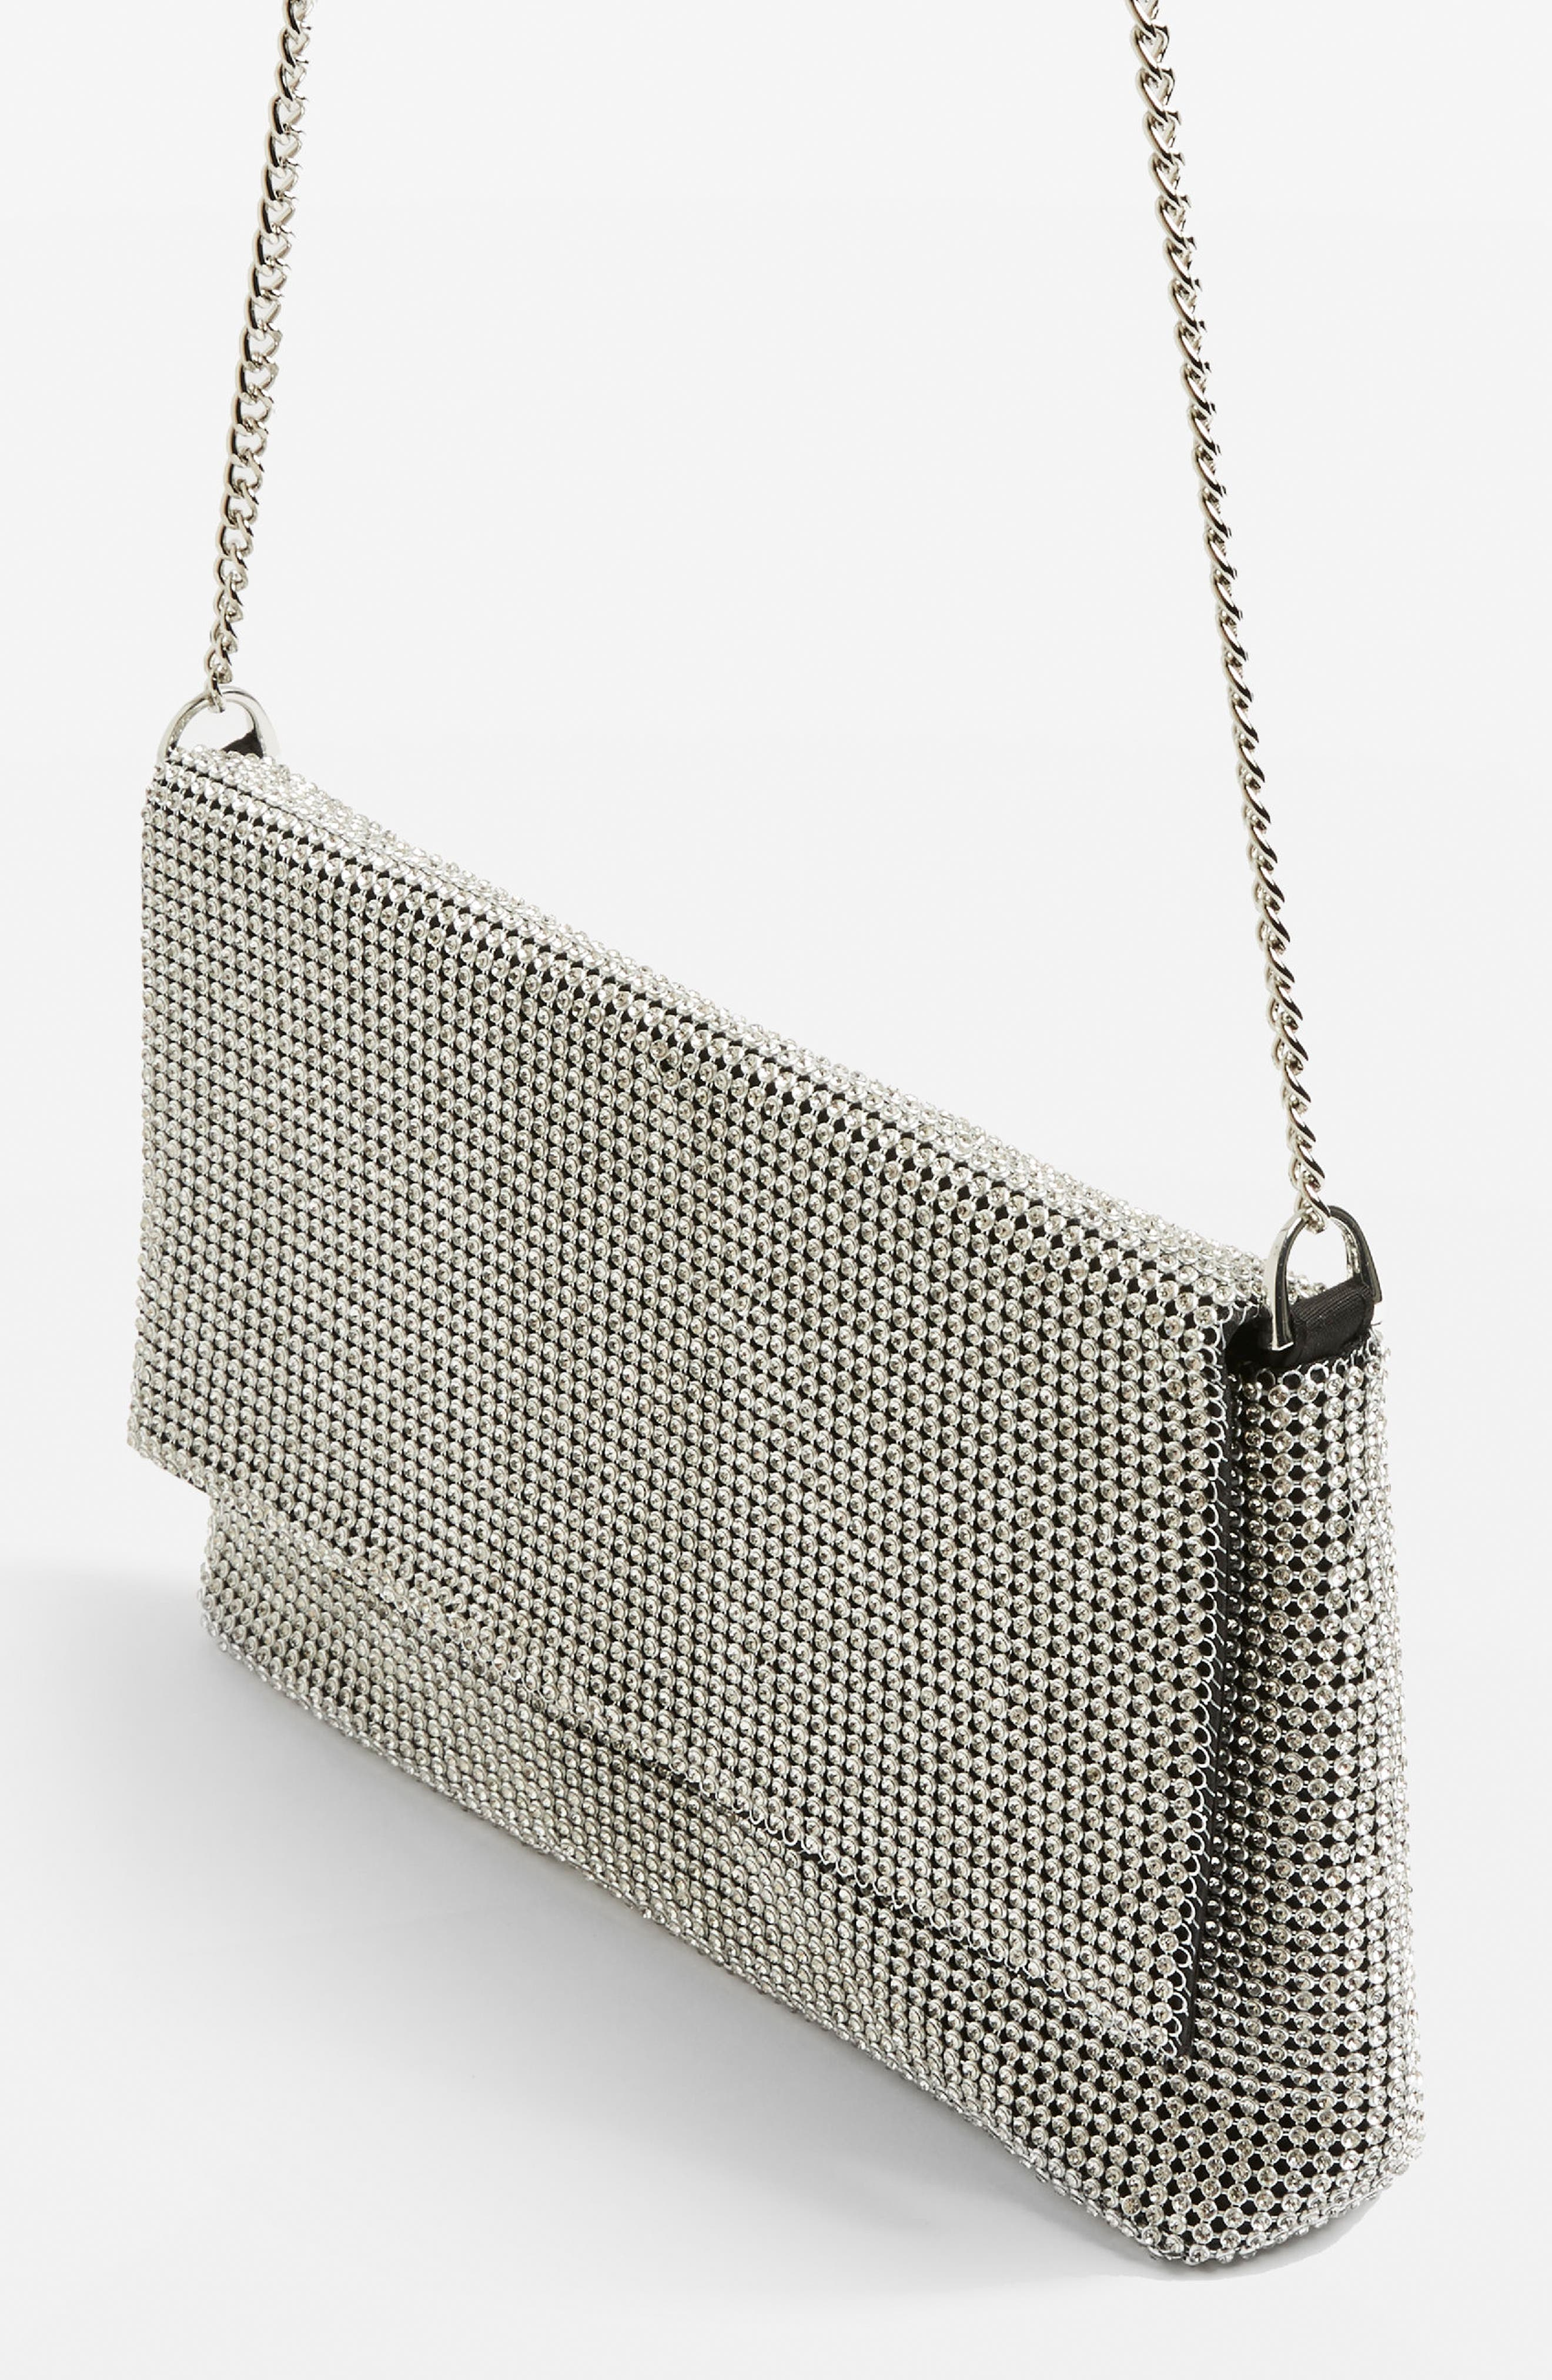 Diana Diamante Clutch Bag,                             Alternate thumbnail 4, color,                             040